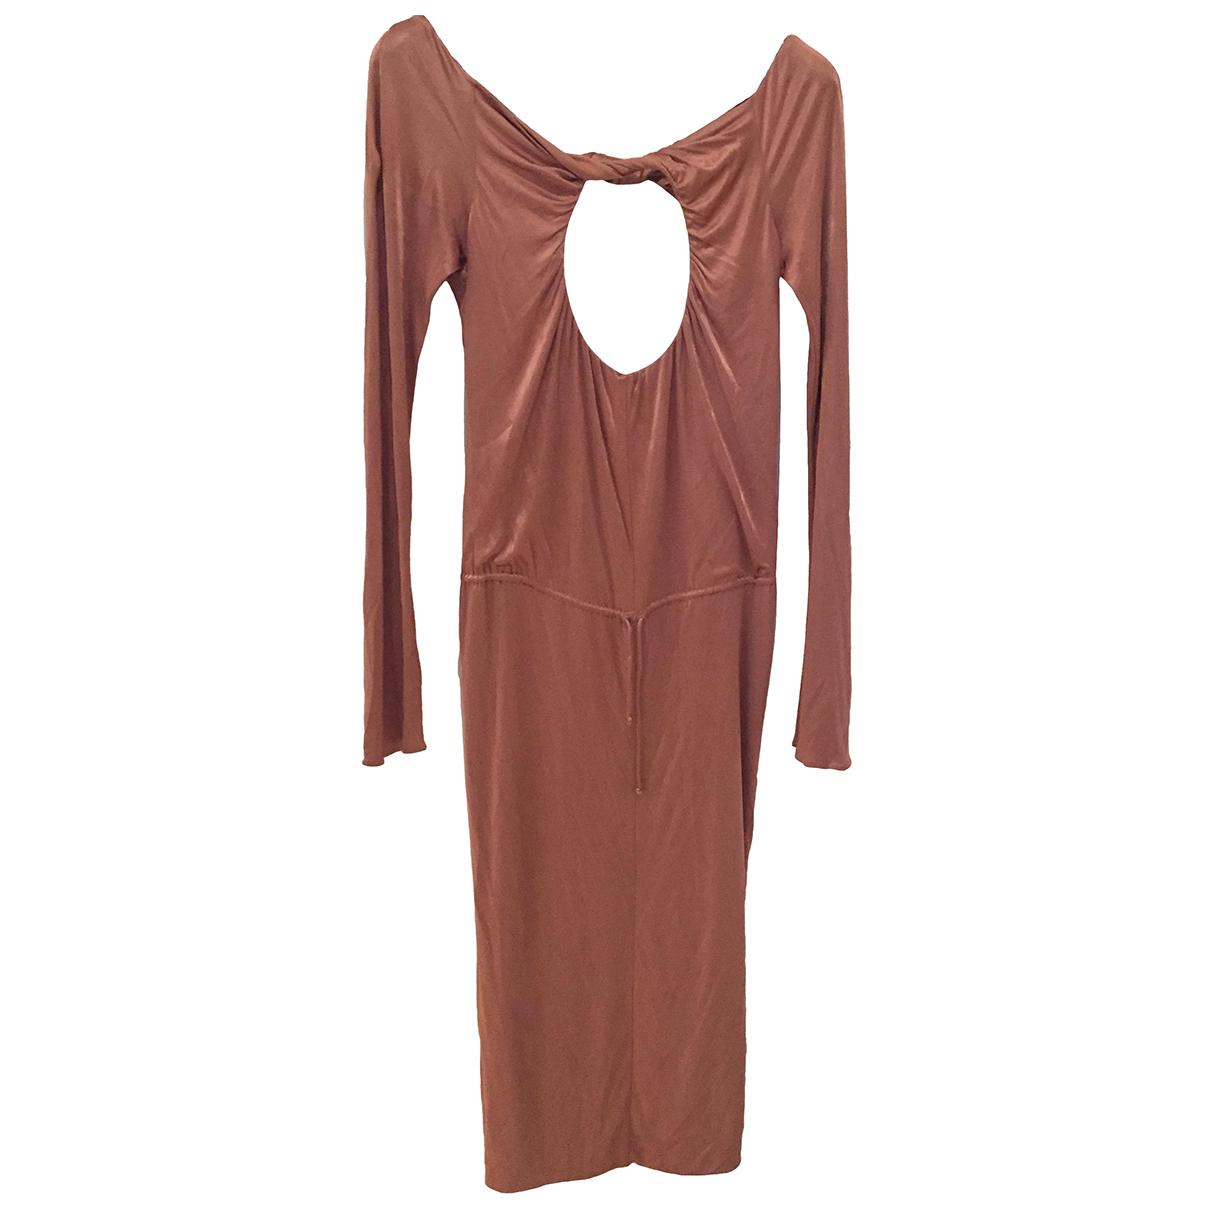 Alexander Mcqueen N Orange dress for Women 40 IT